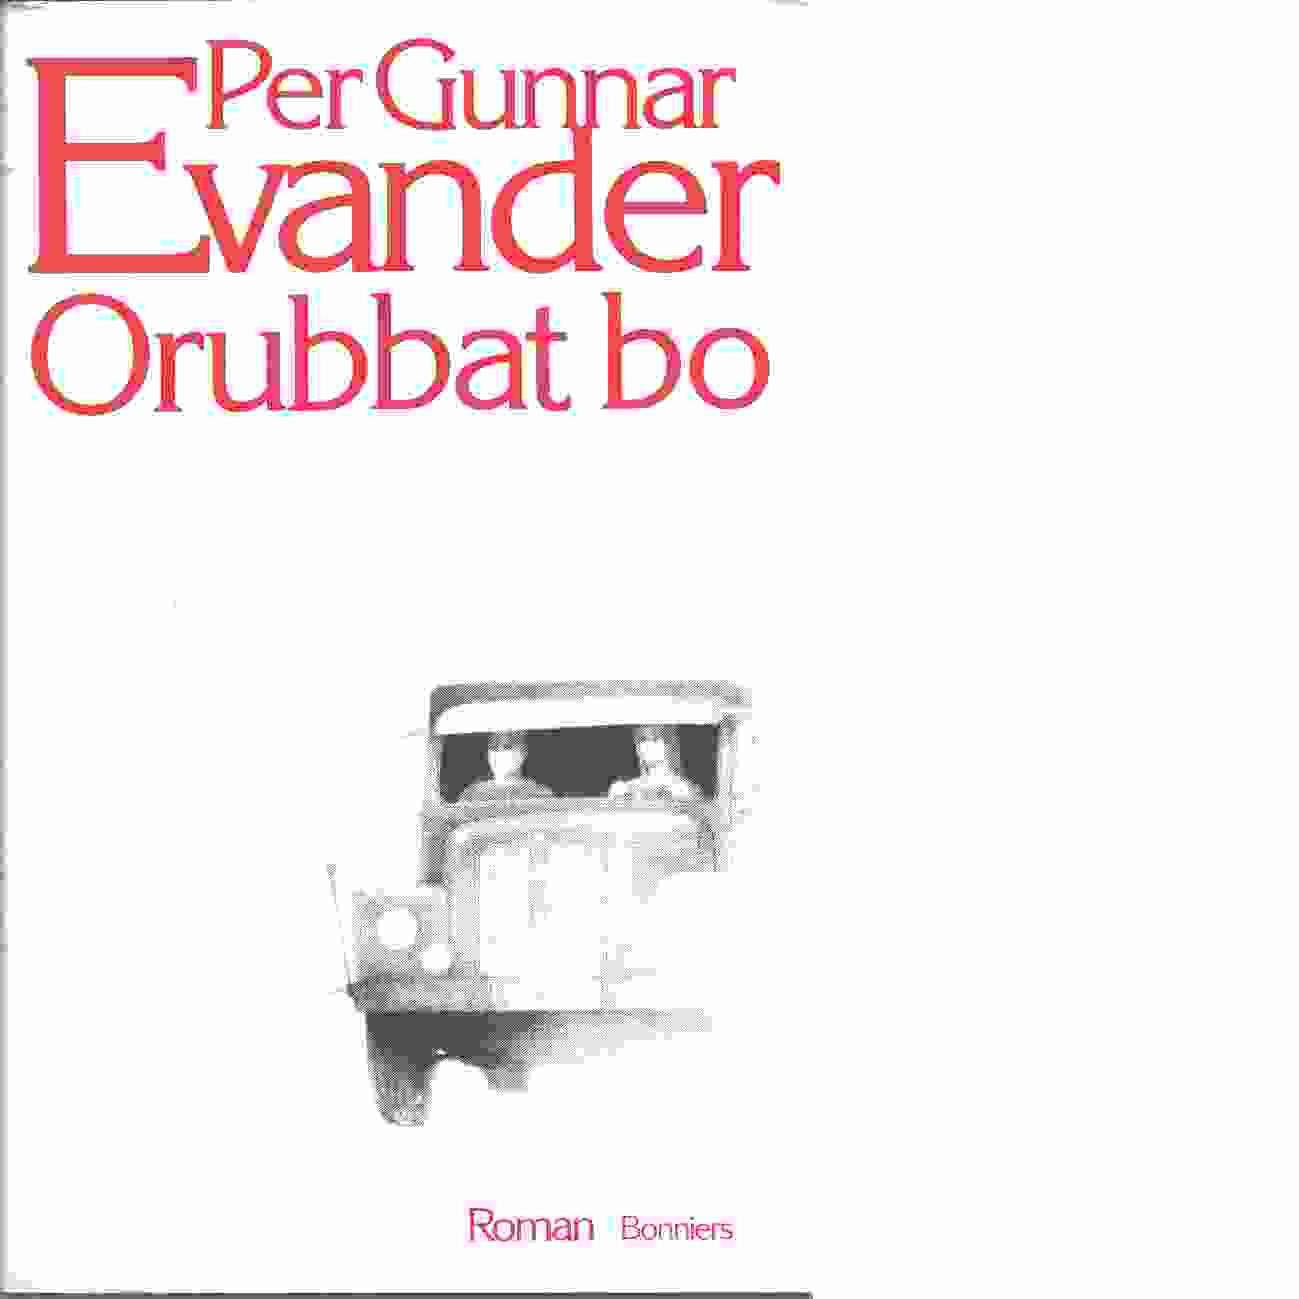 Orubbat bo - Evander, Per Gunnar